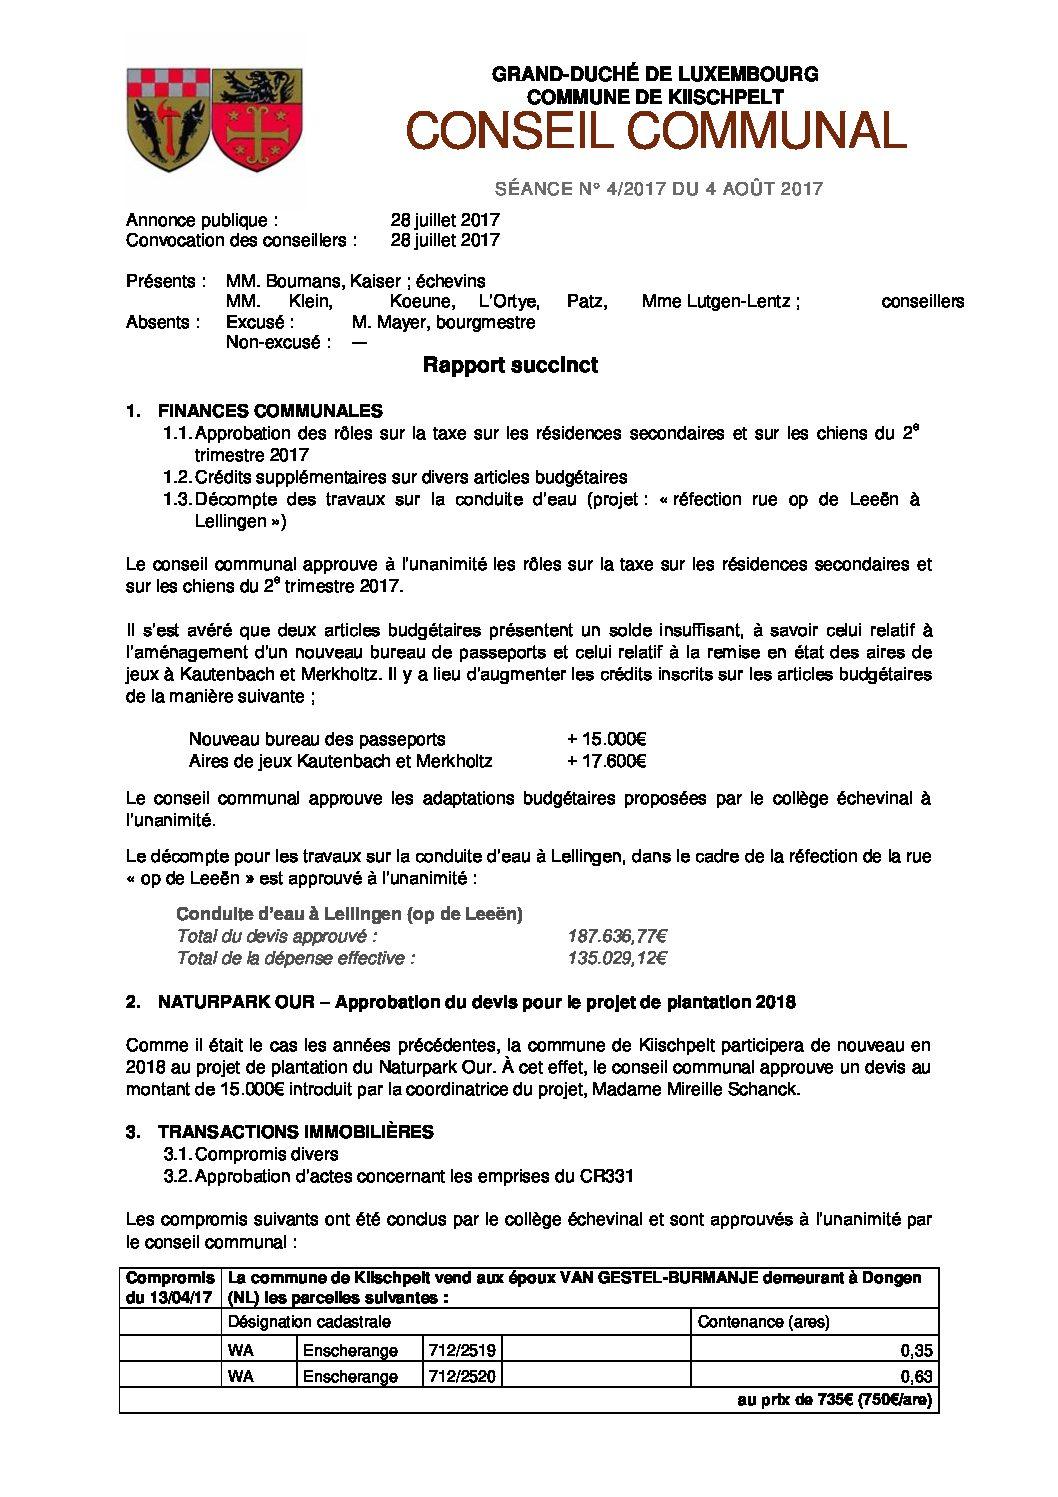 Rapport du conseil communal du 3 août 2017